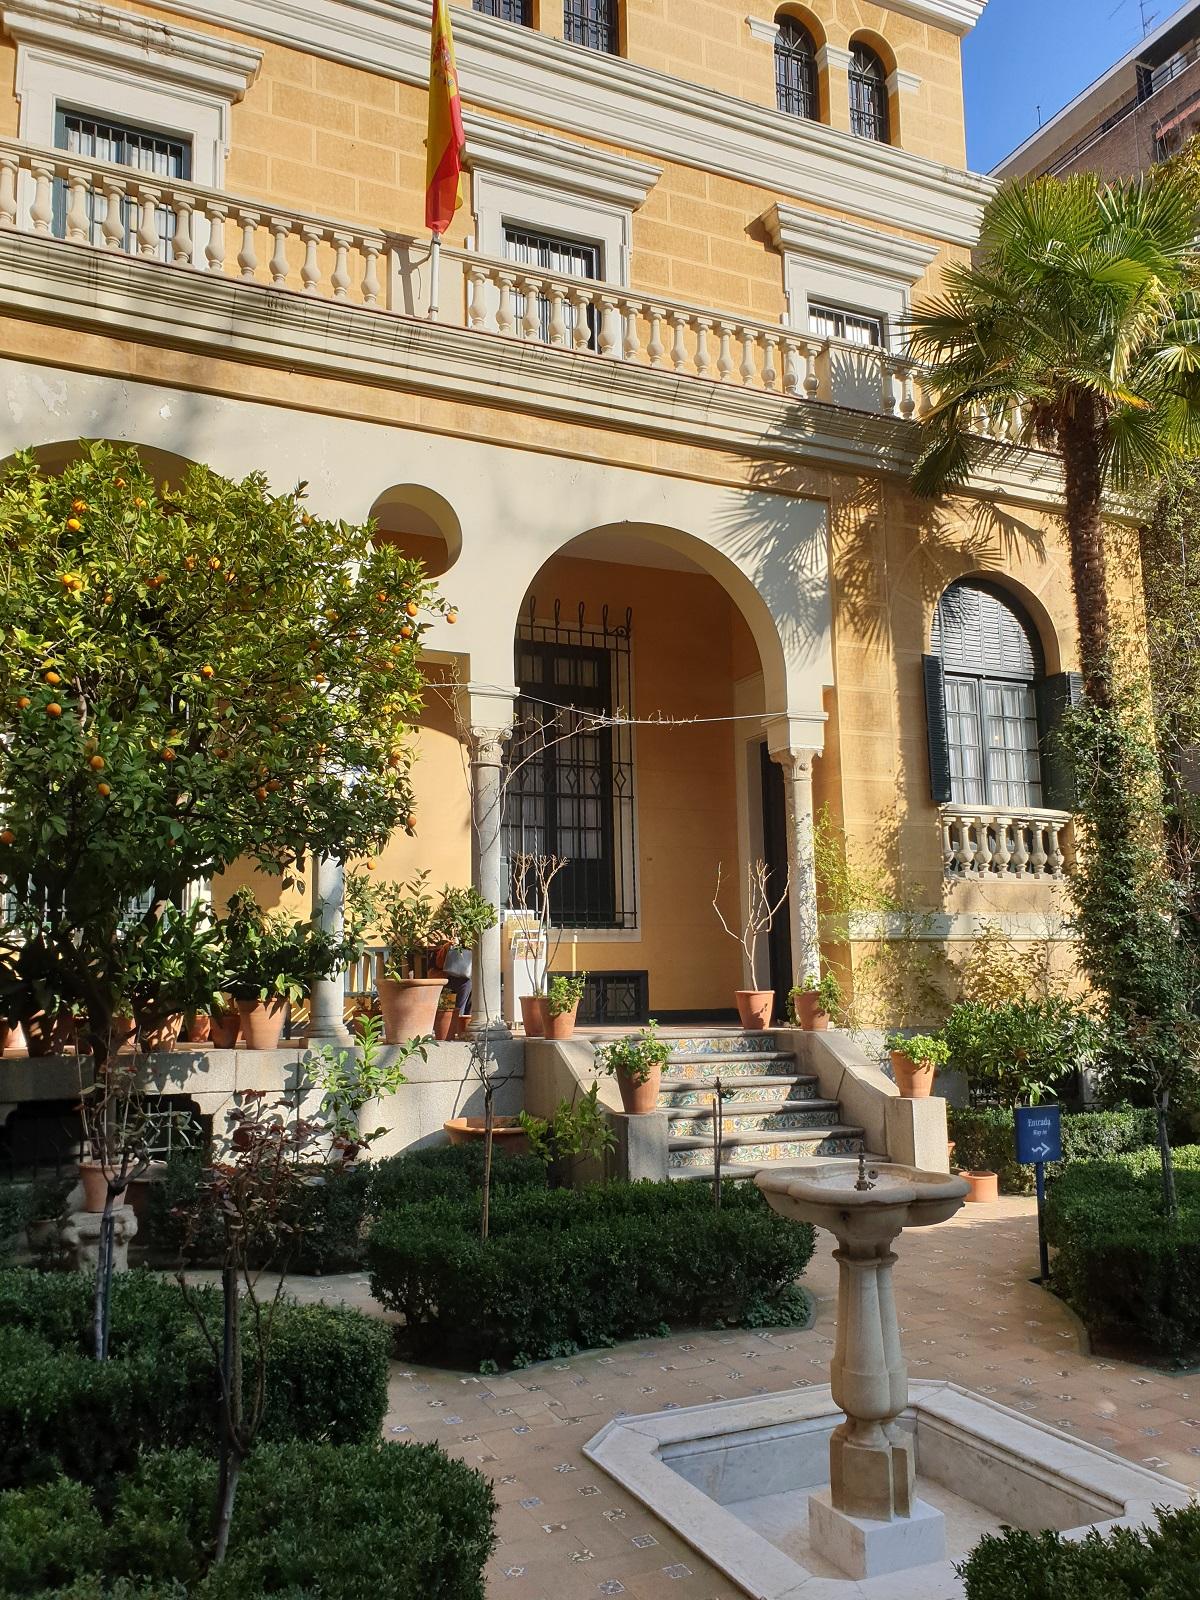 Tuin_Sorolla museum_Madrid